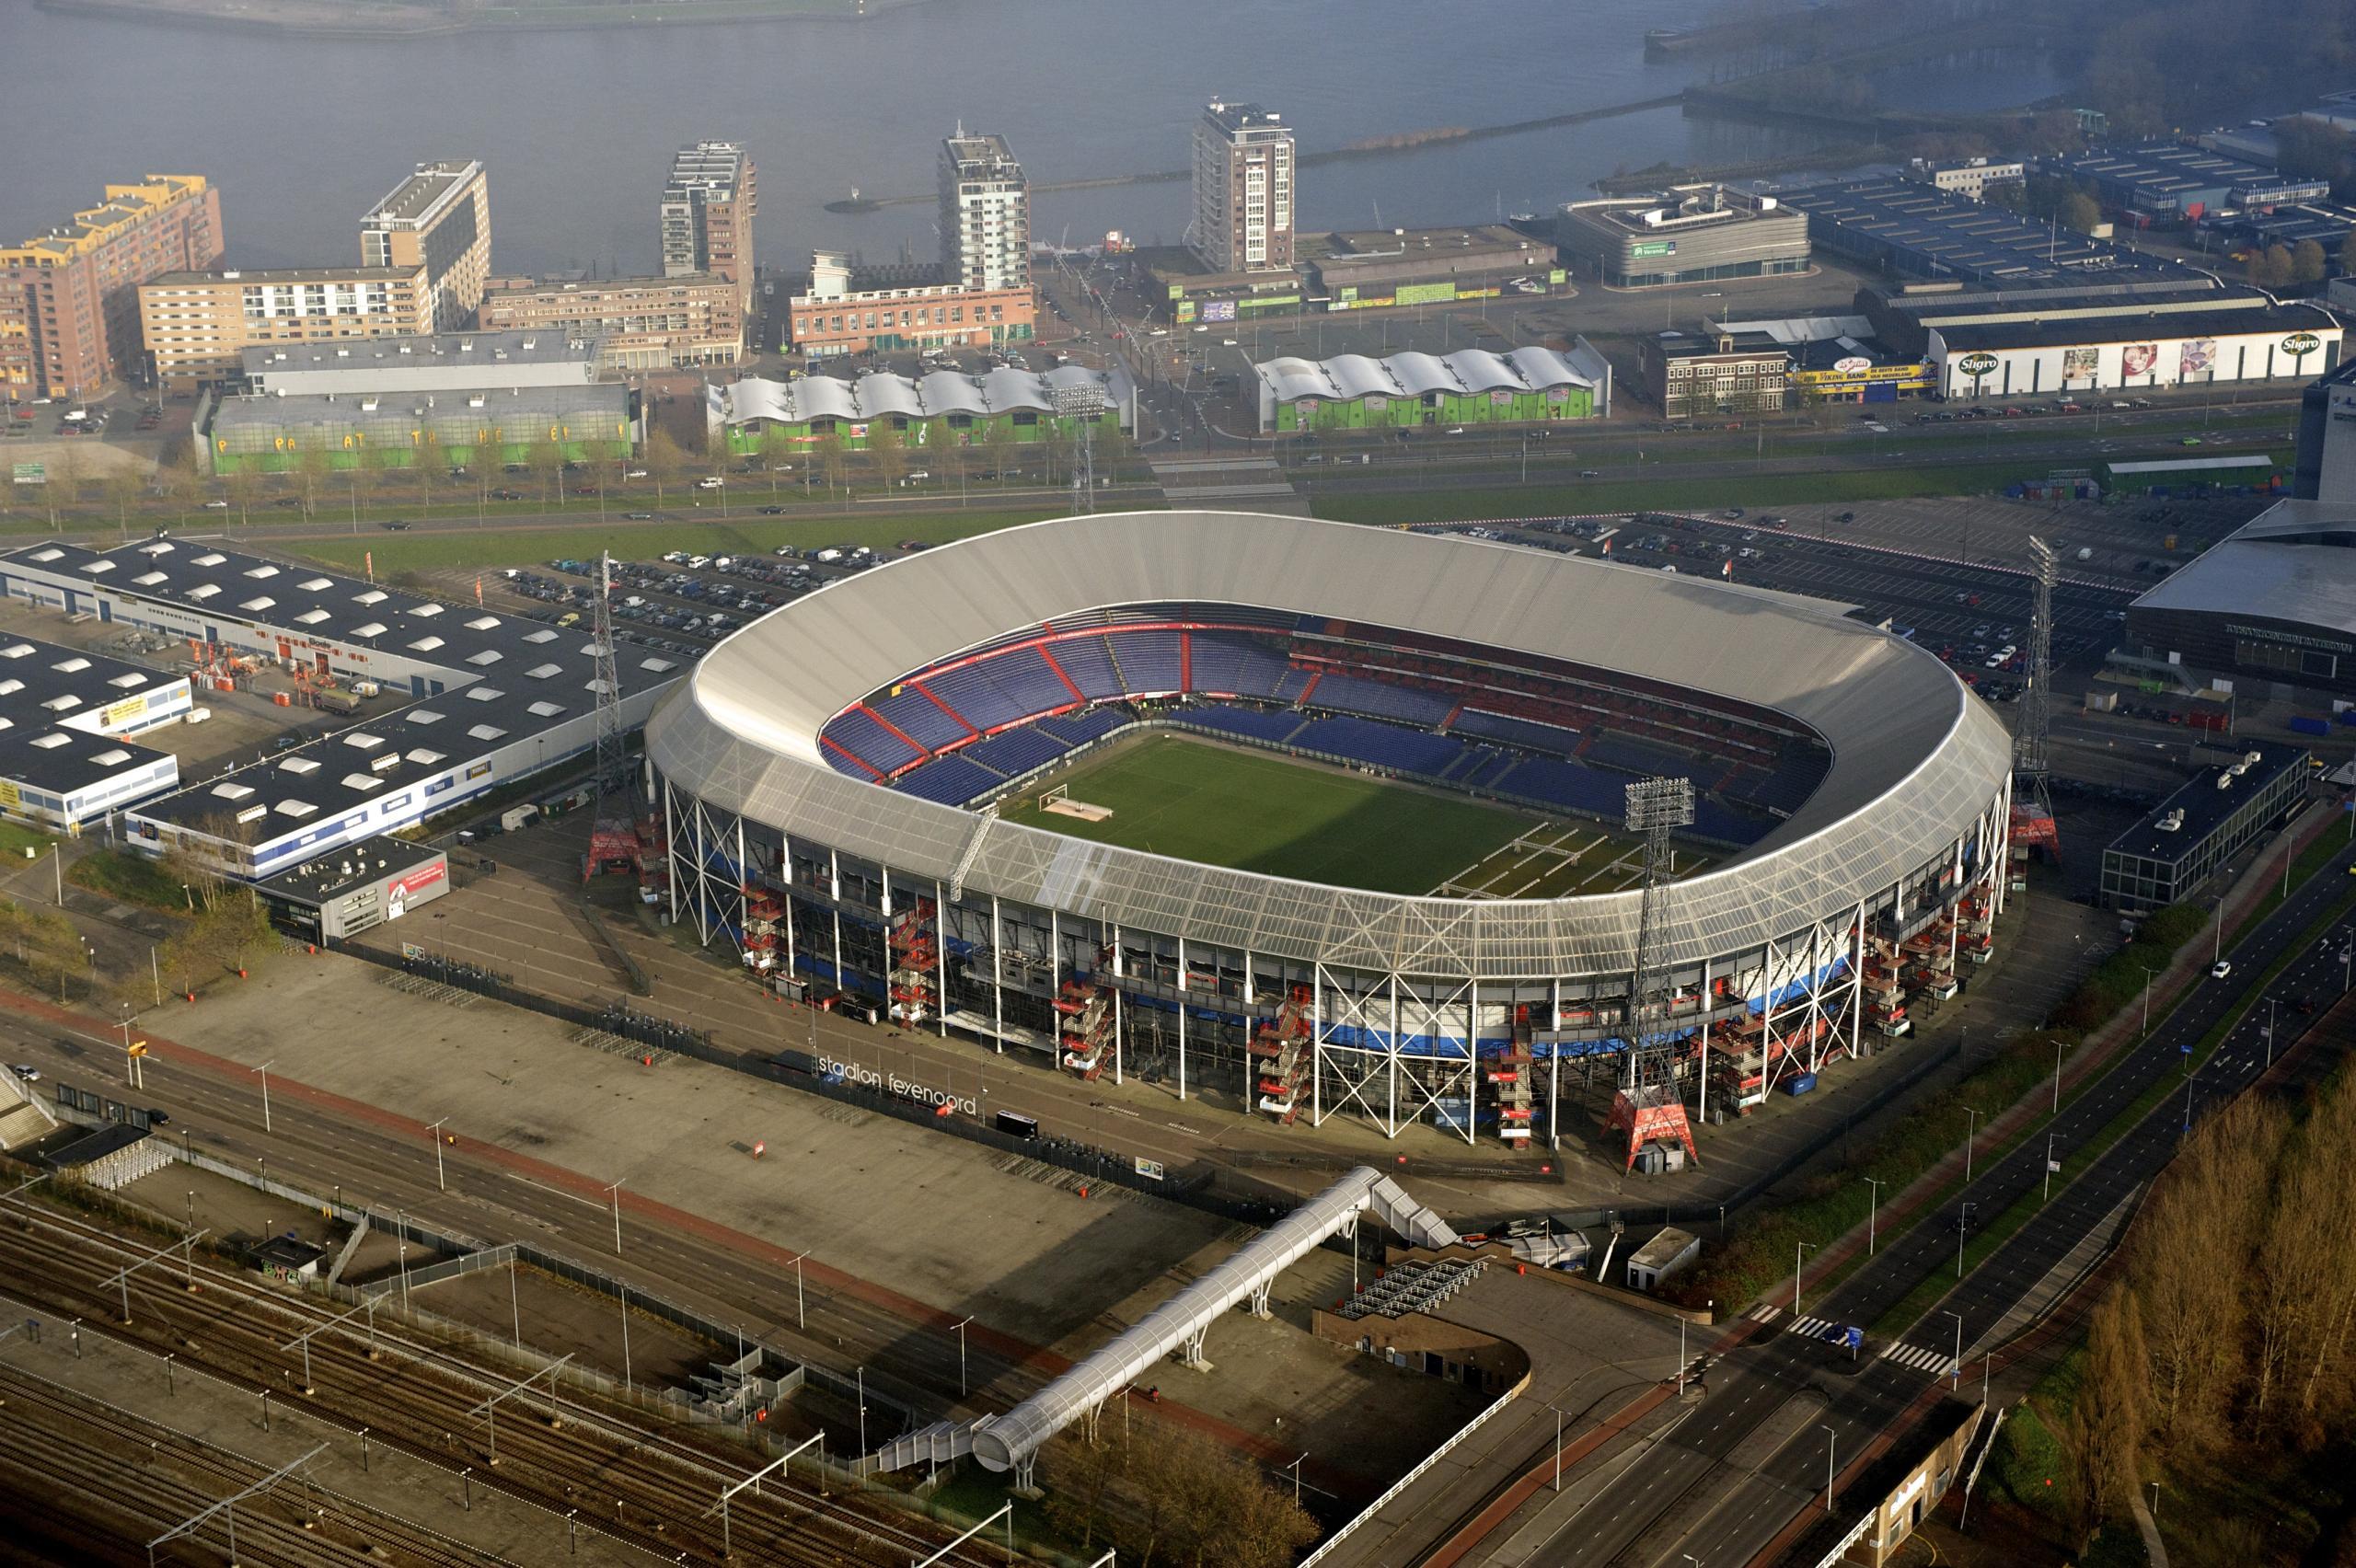 Feyenoord Stadion 'de Kuip' Rotterdam